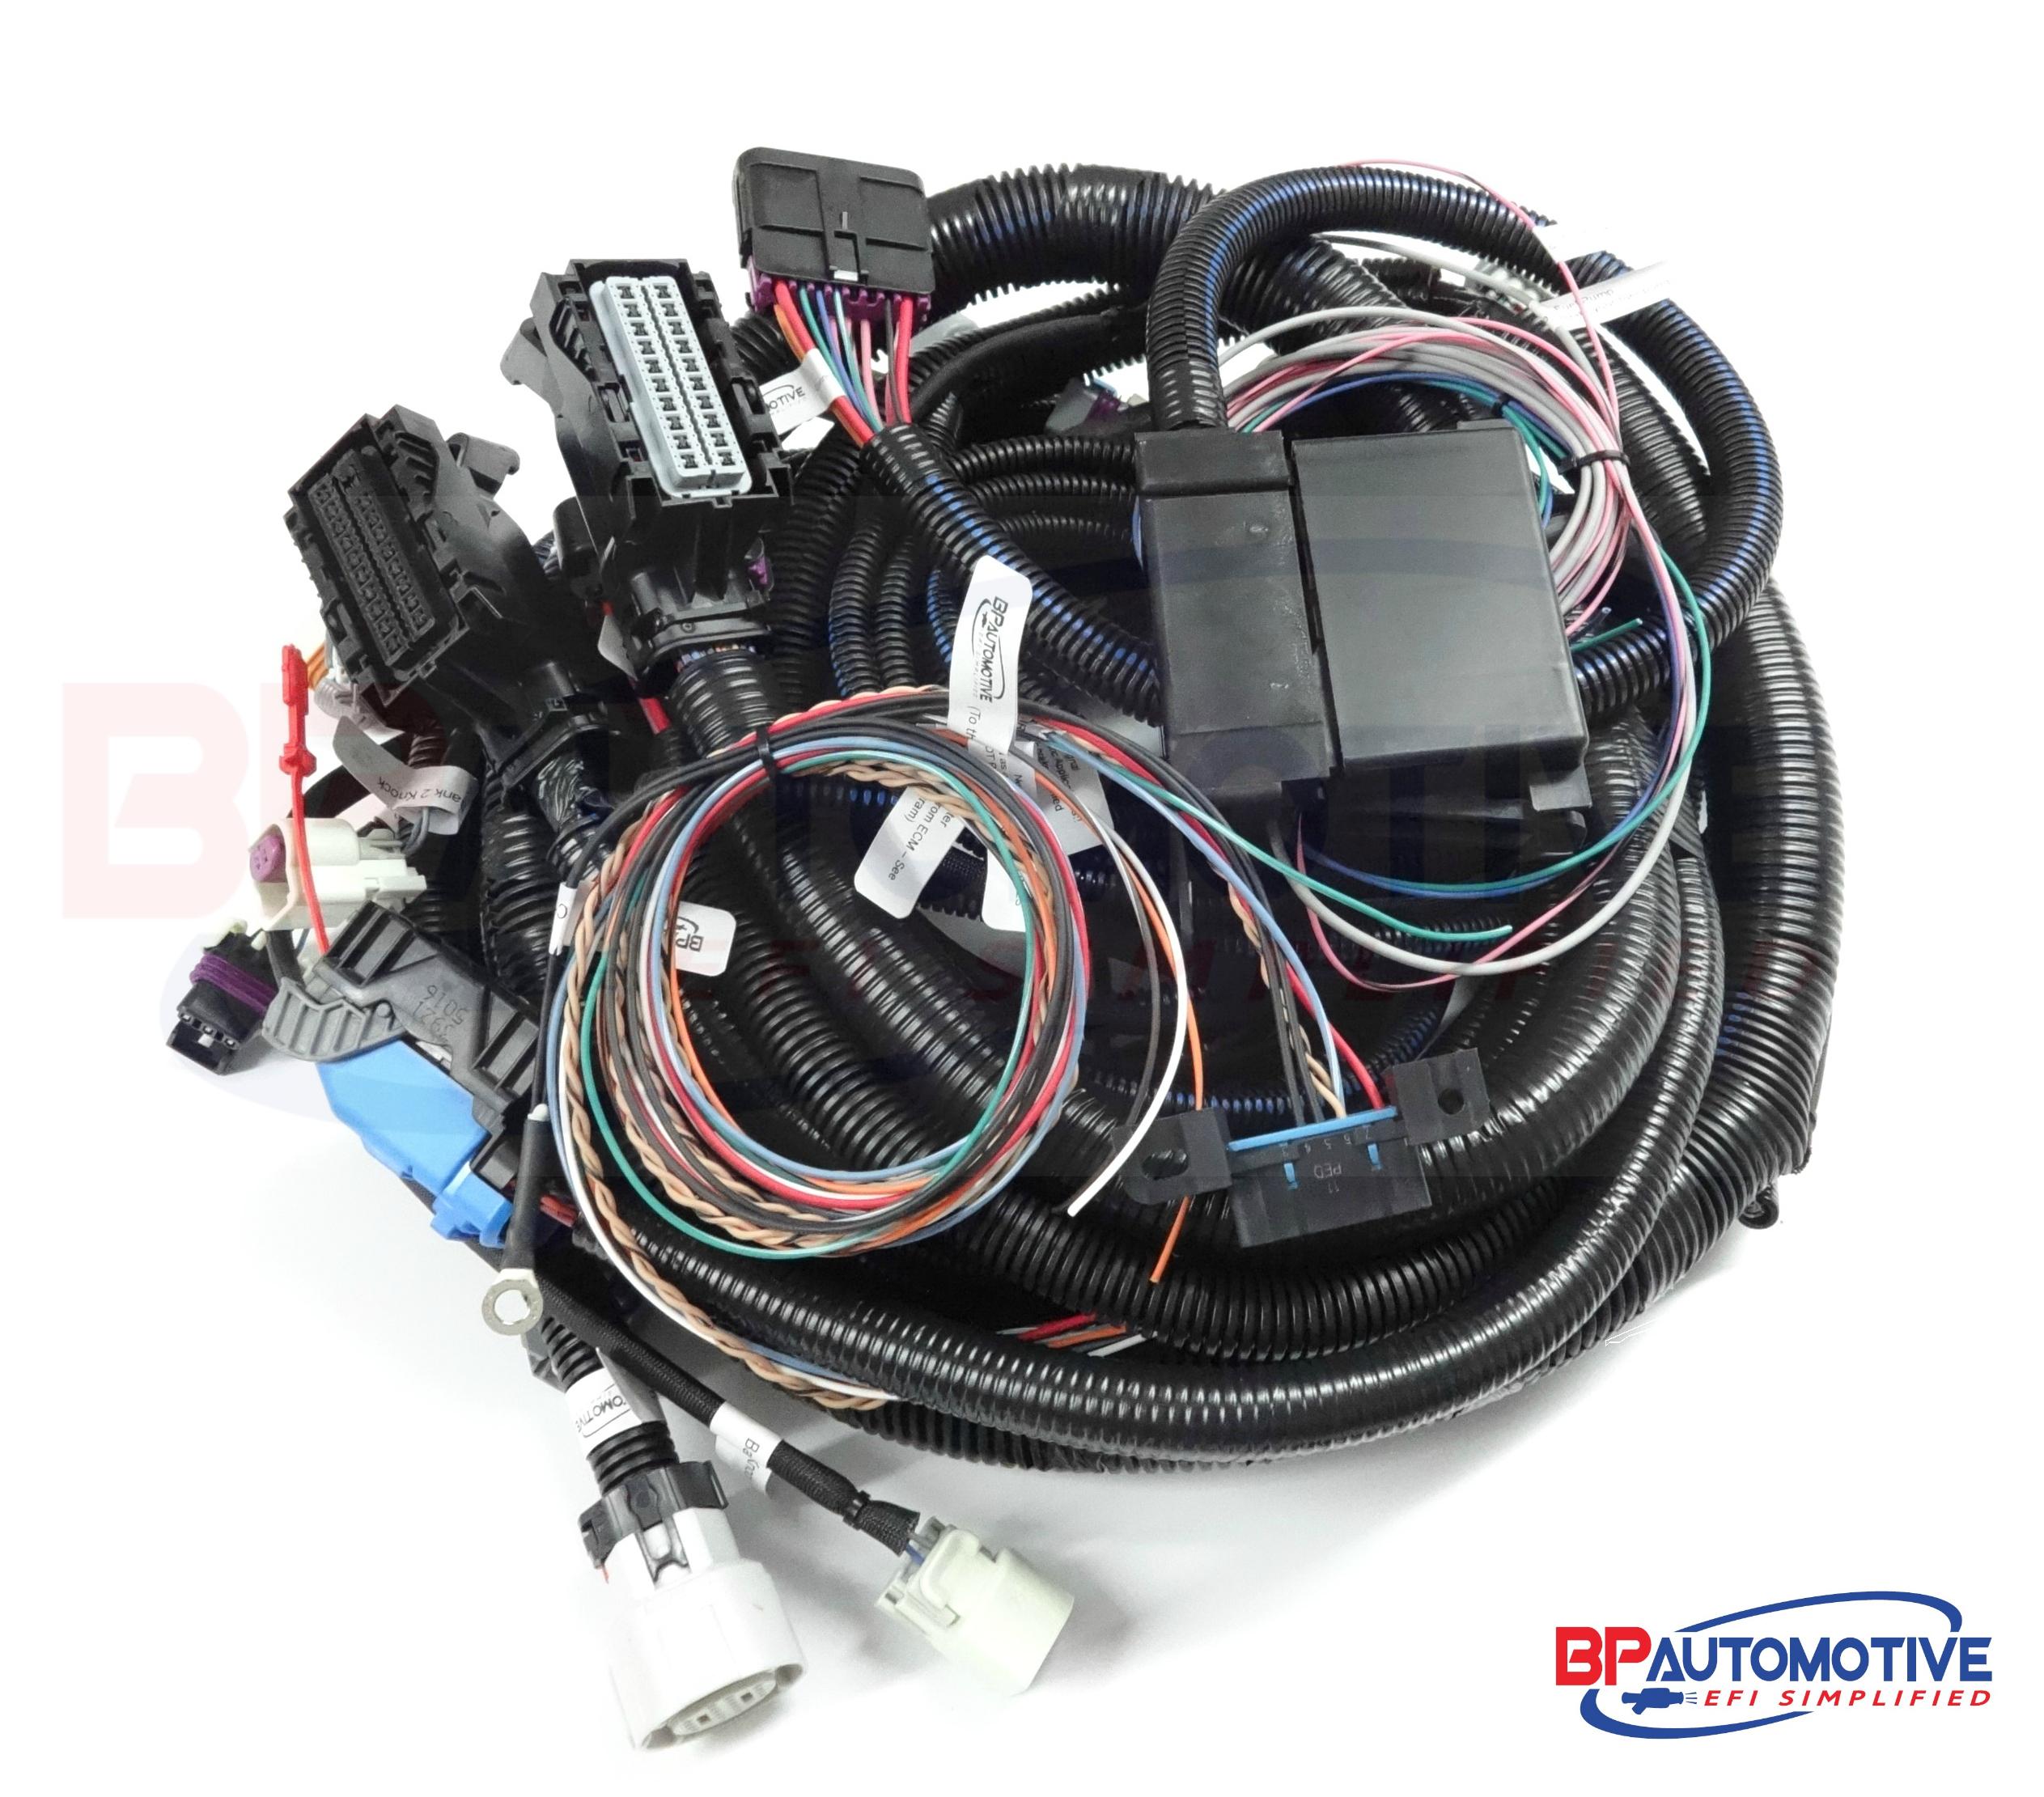 2007 Tr6060 Or Non Electric